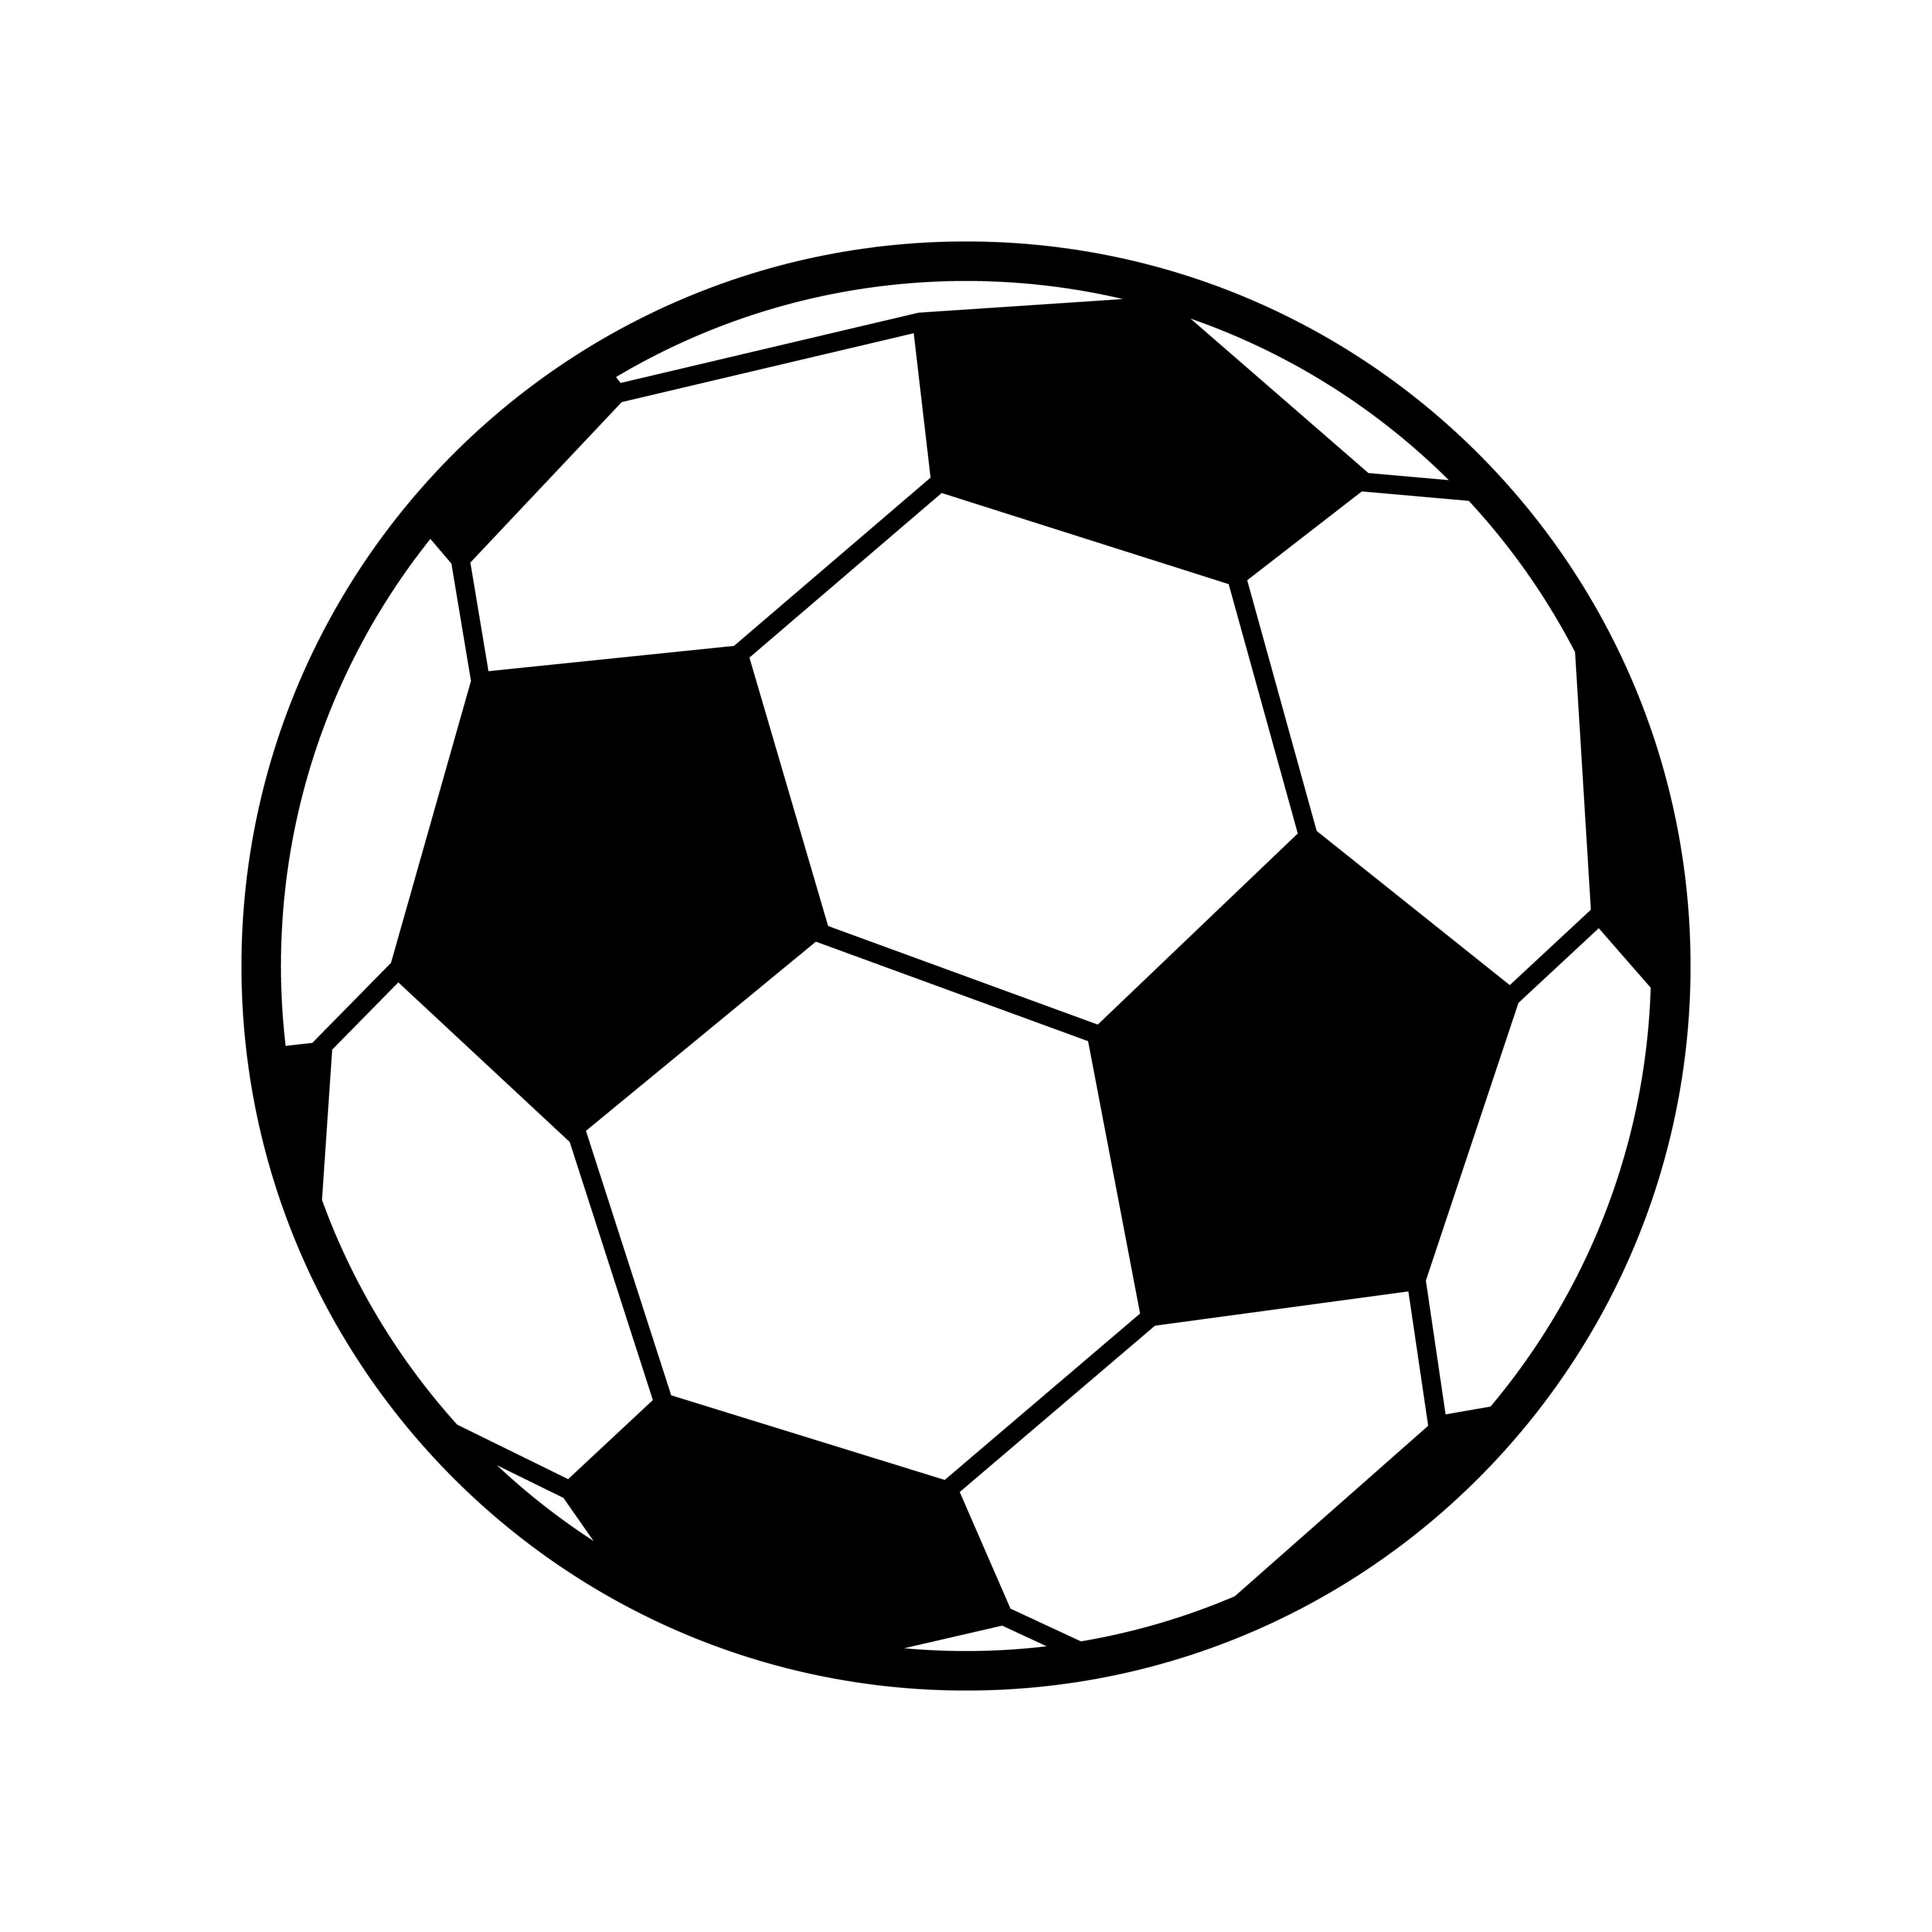 fußballvektorsymbol 550584 vektor kunst bei vecteezy